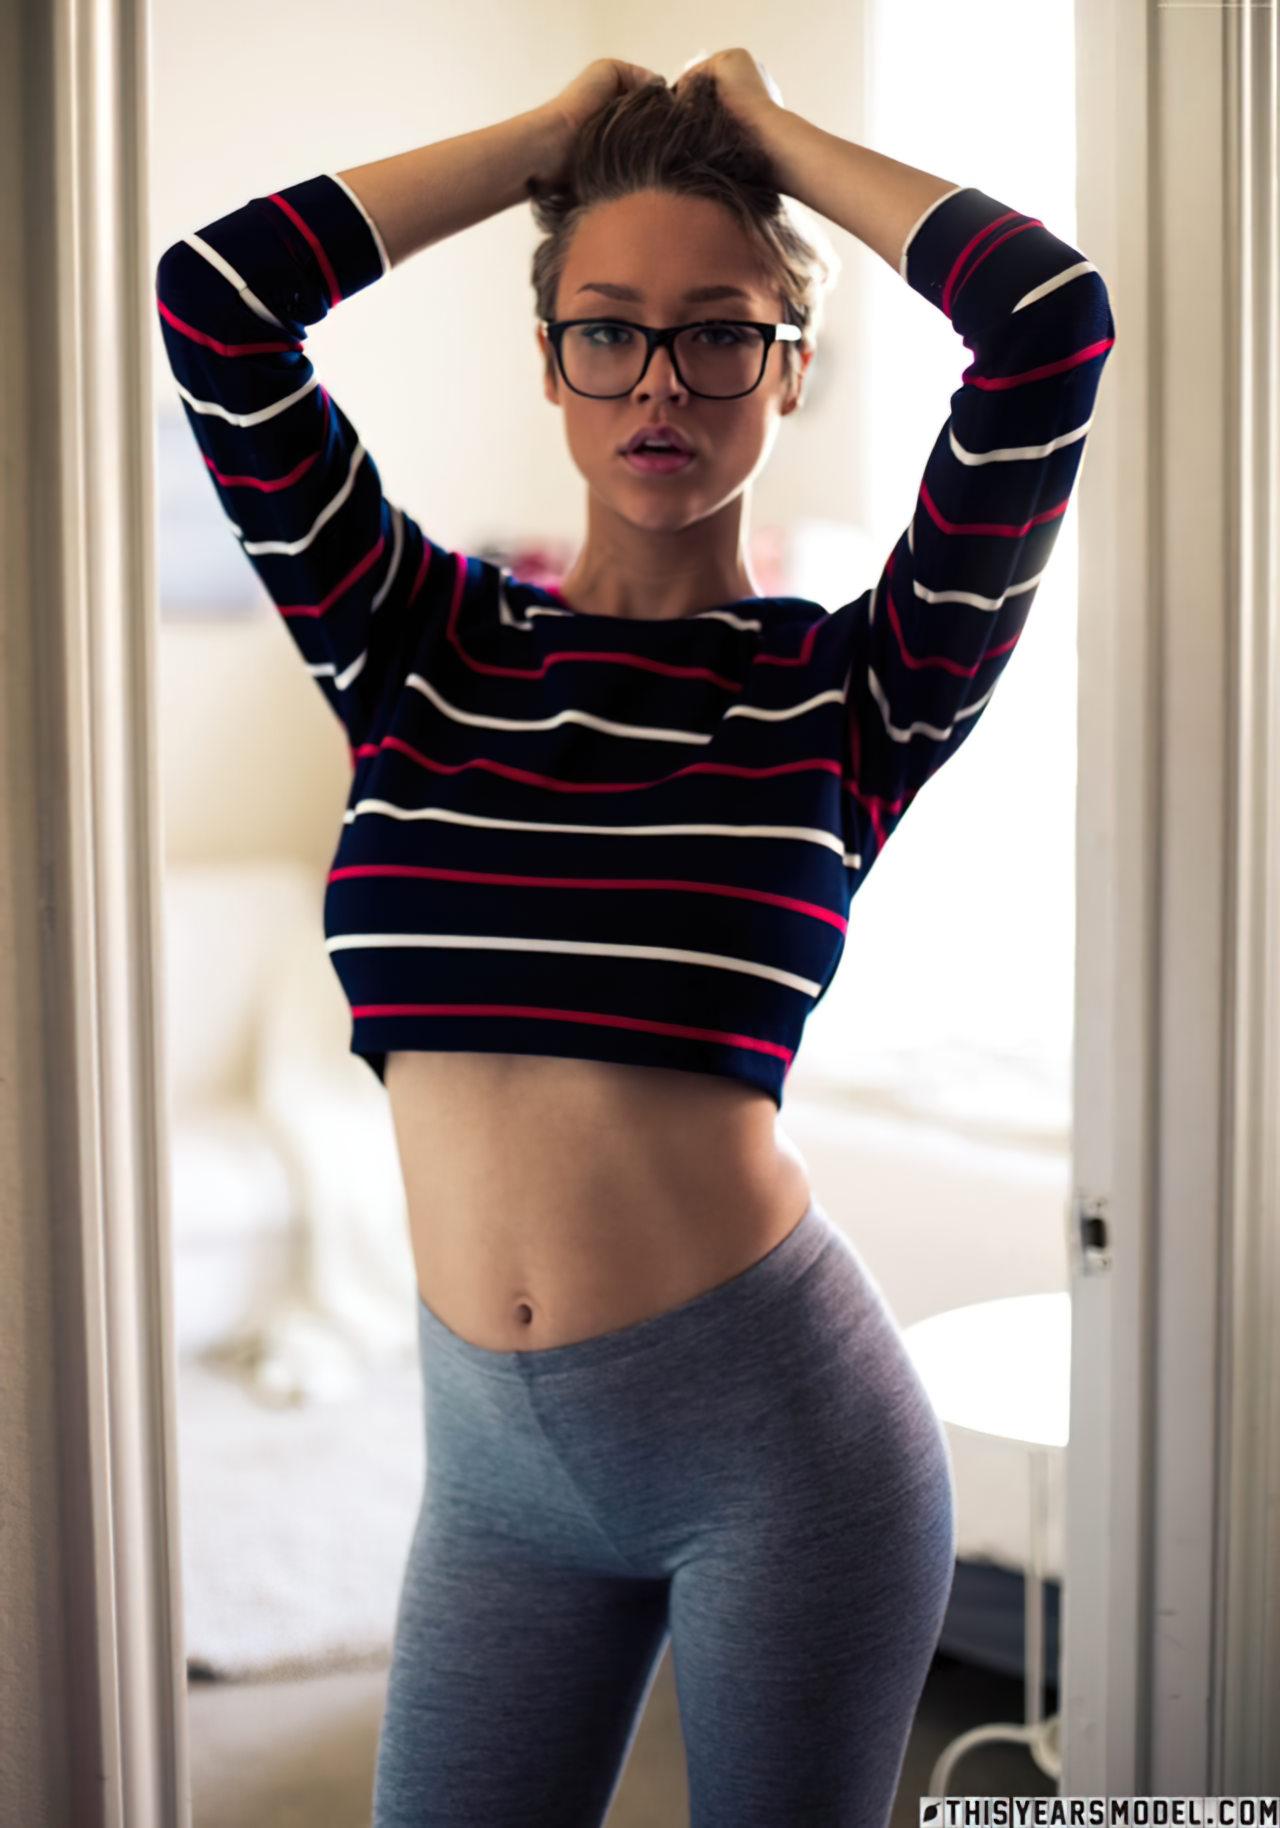 Sabrina Nichole Tirando a Roupa (1)